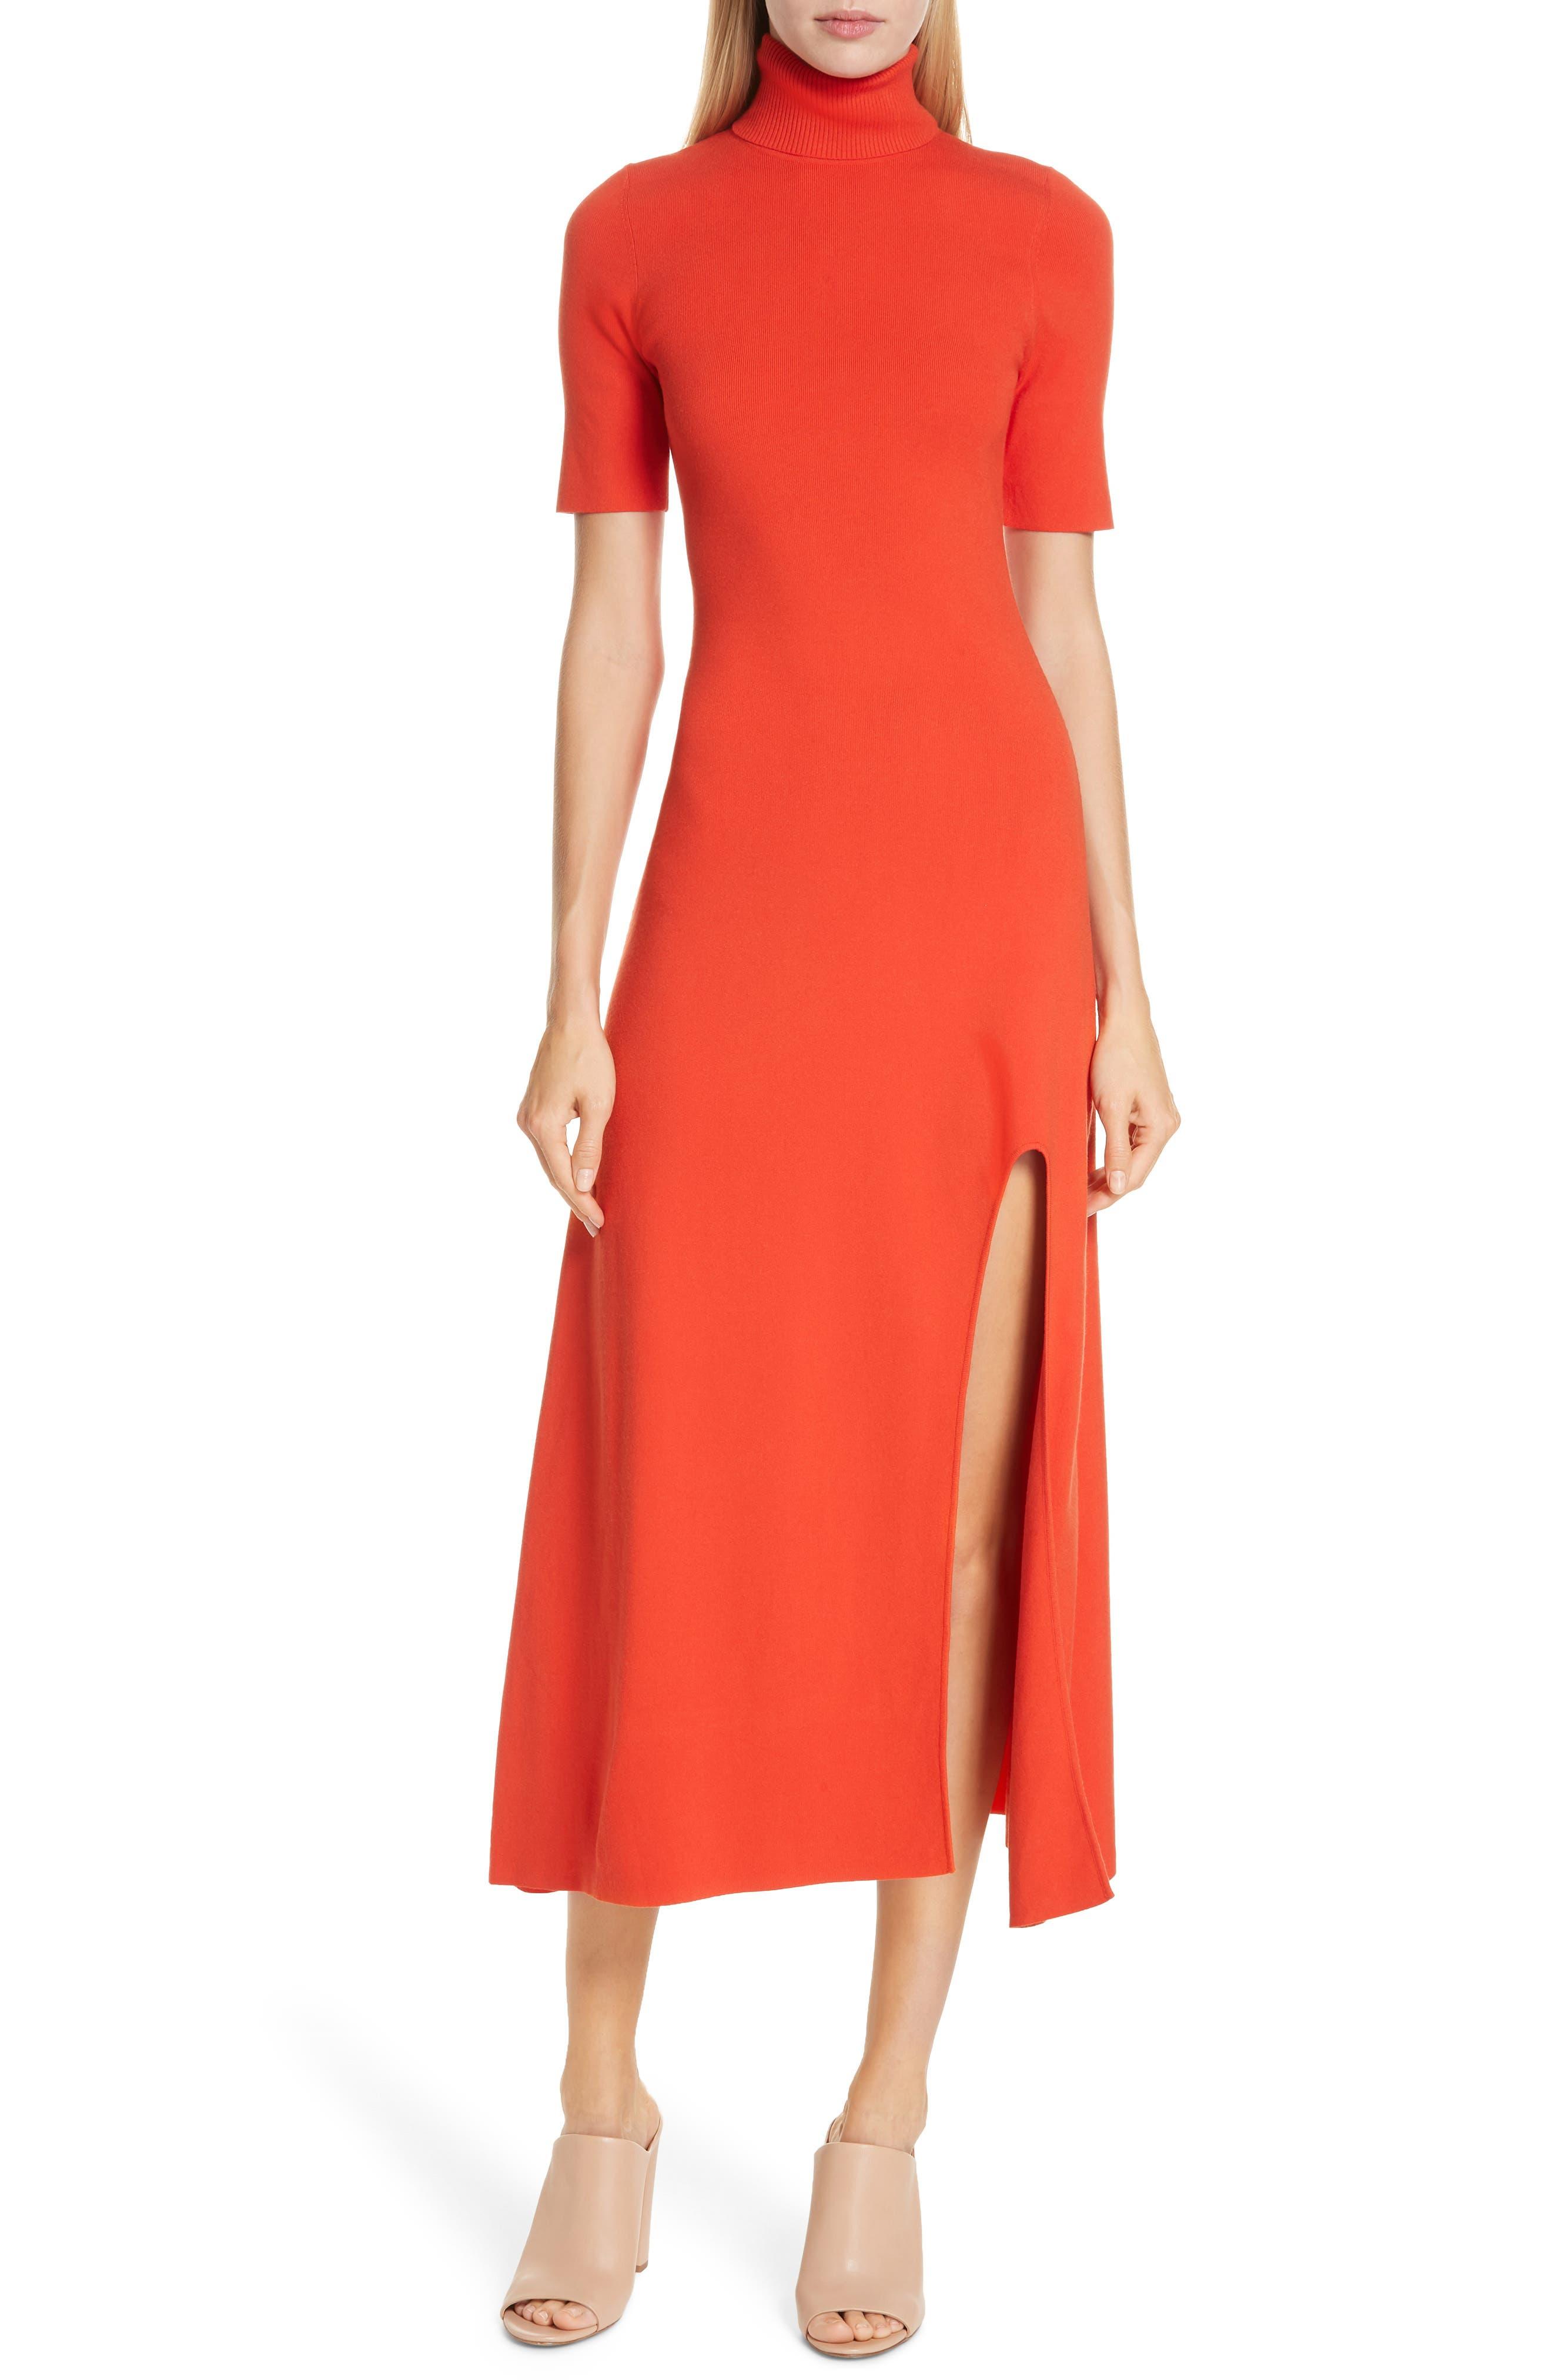 A.l.c. Caplan Slit Midi Dress, Orange